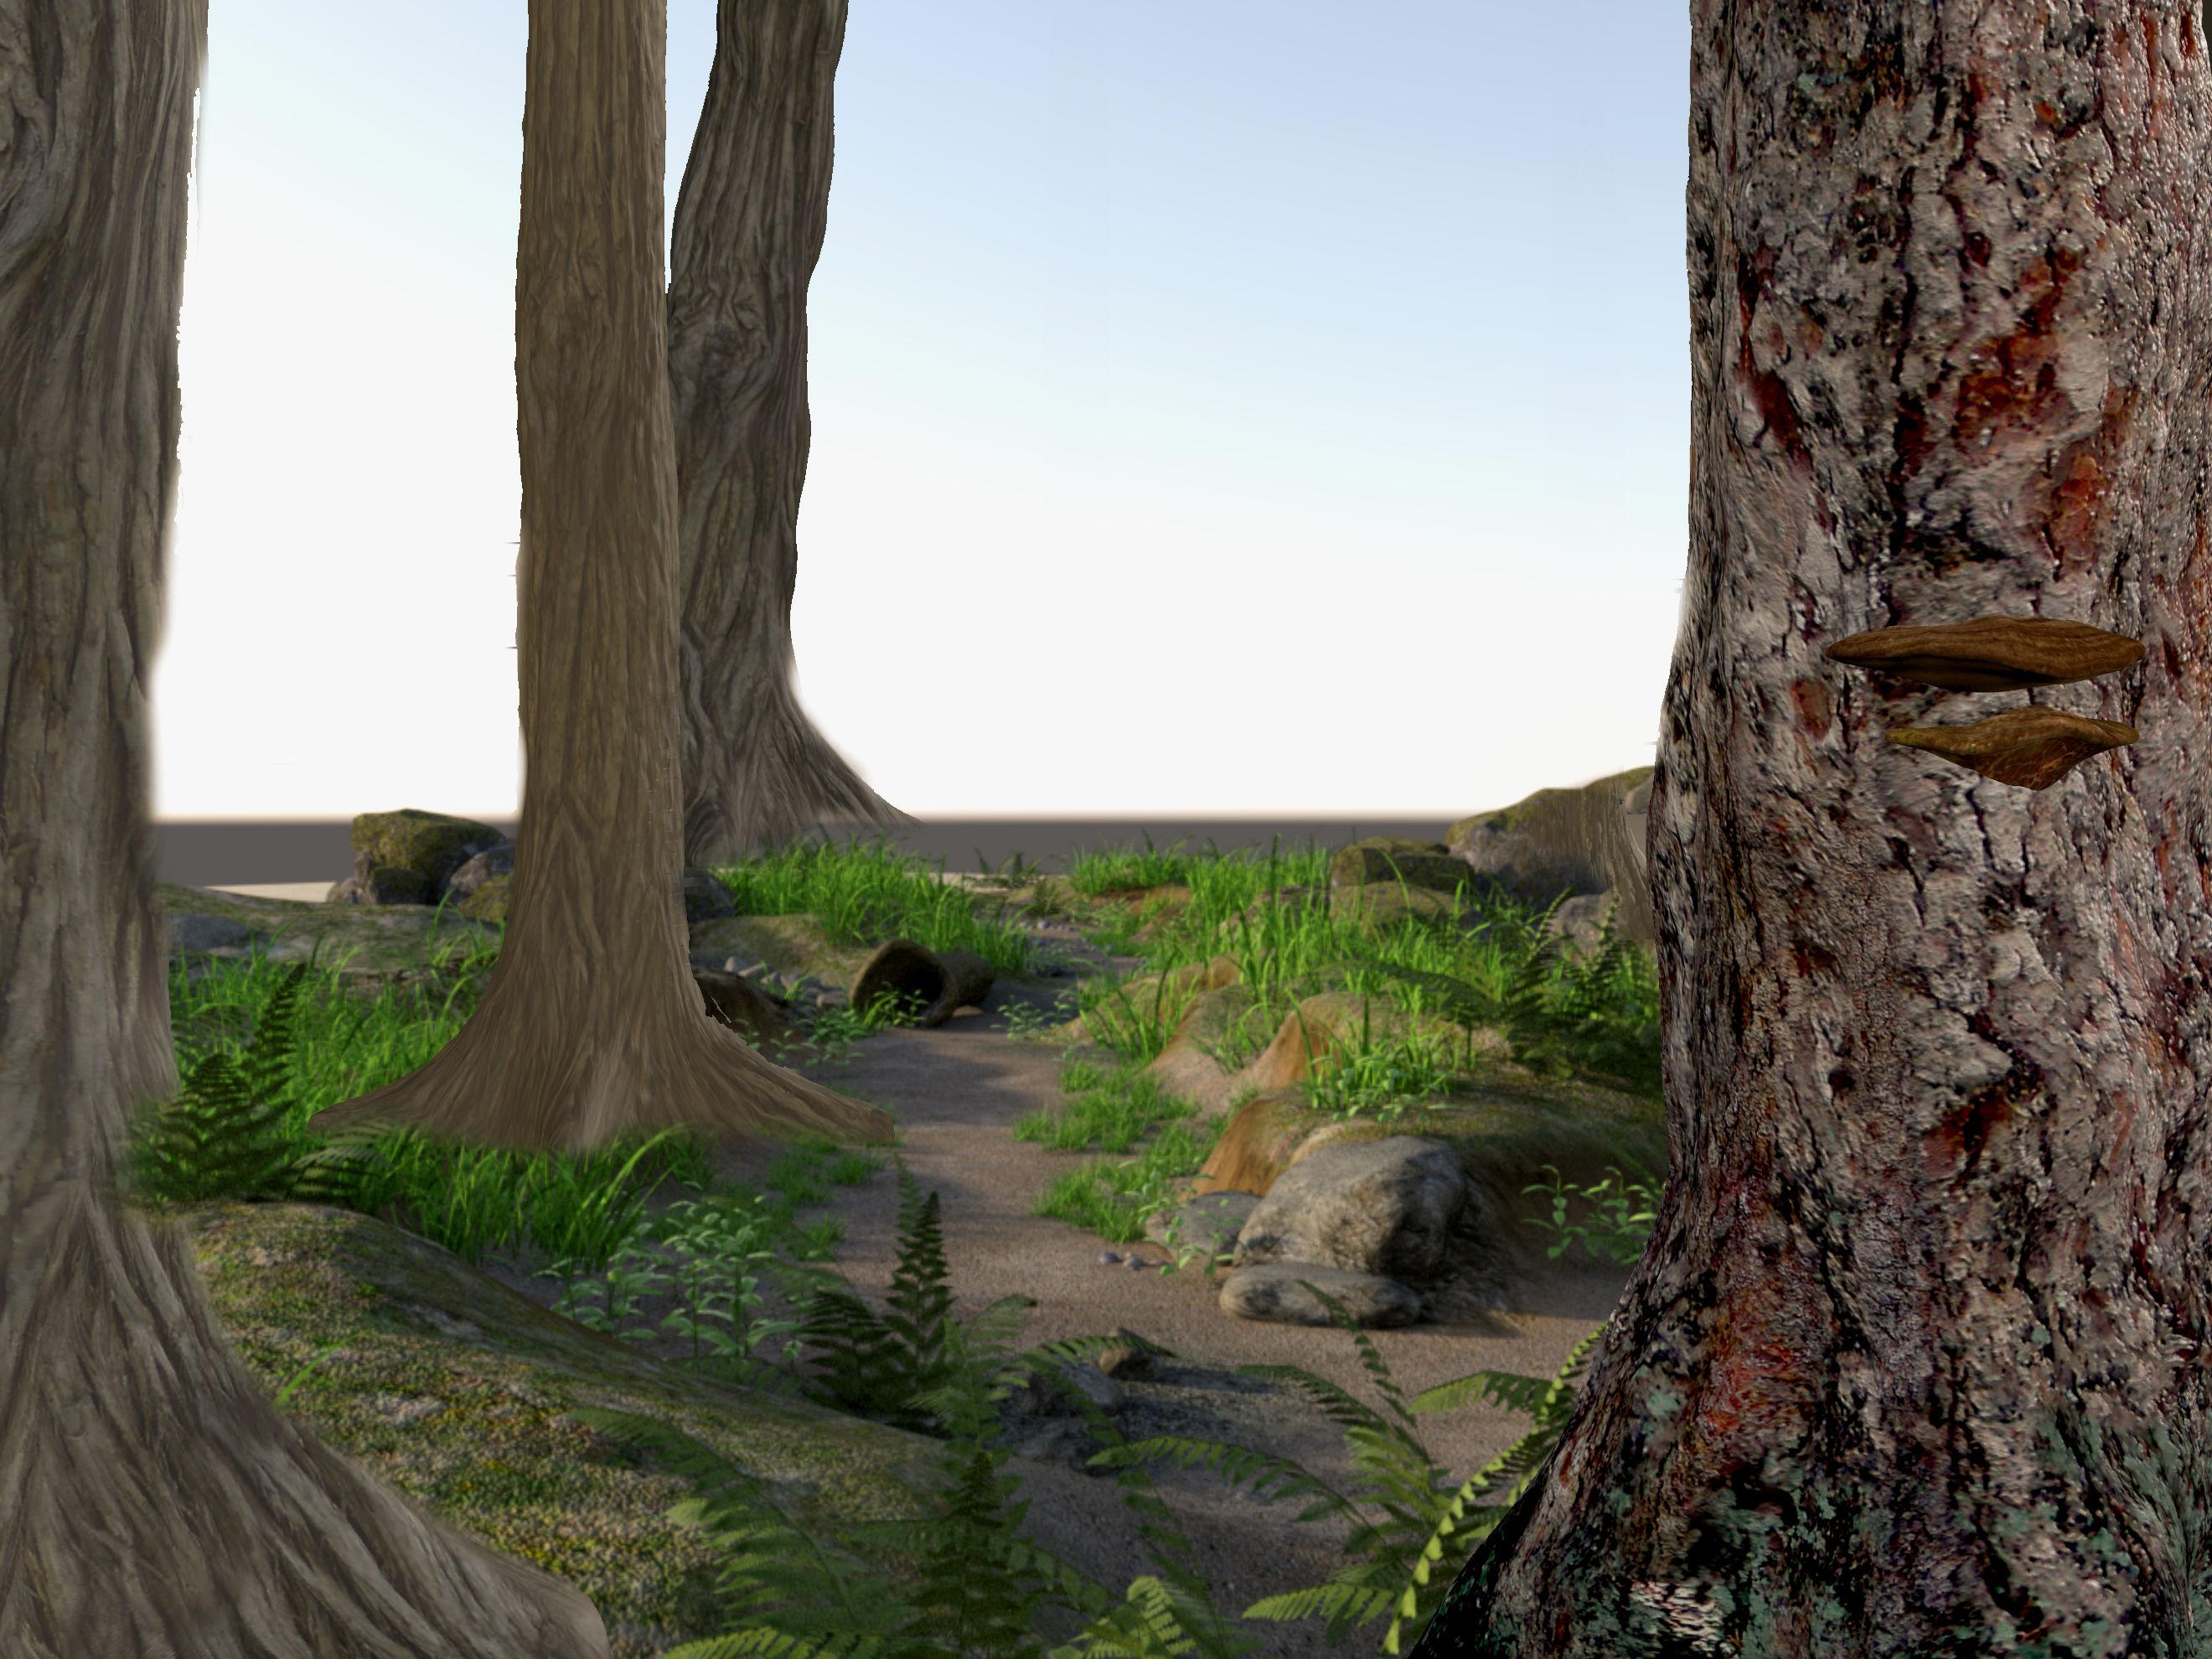 Forest Illustration, Rendering, Setting, Tree, Landscape, HQ Photo